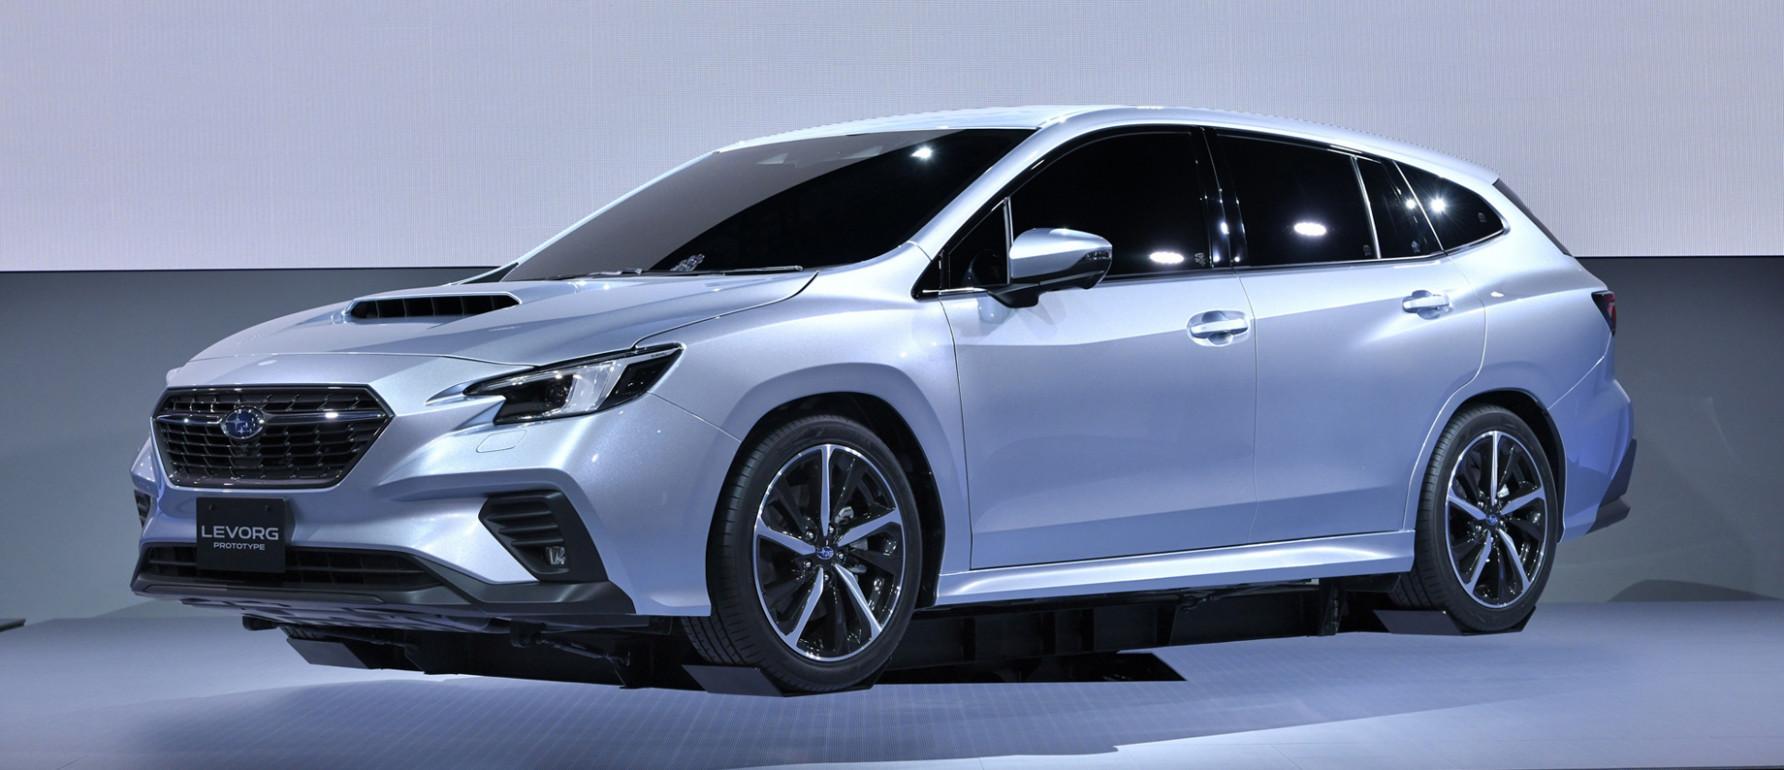 Review 2022 Subaru Legacy Turbo Gt